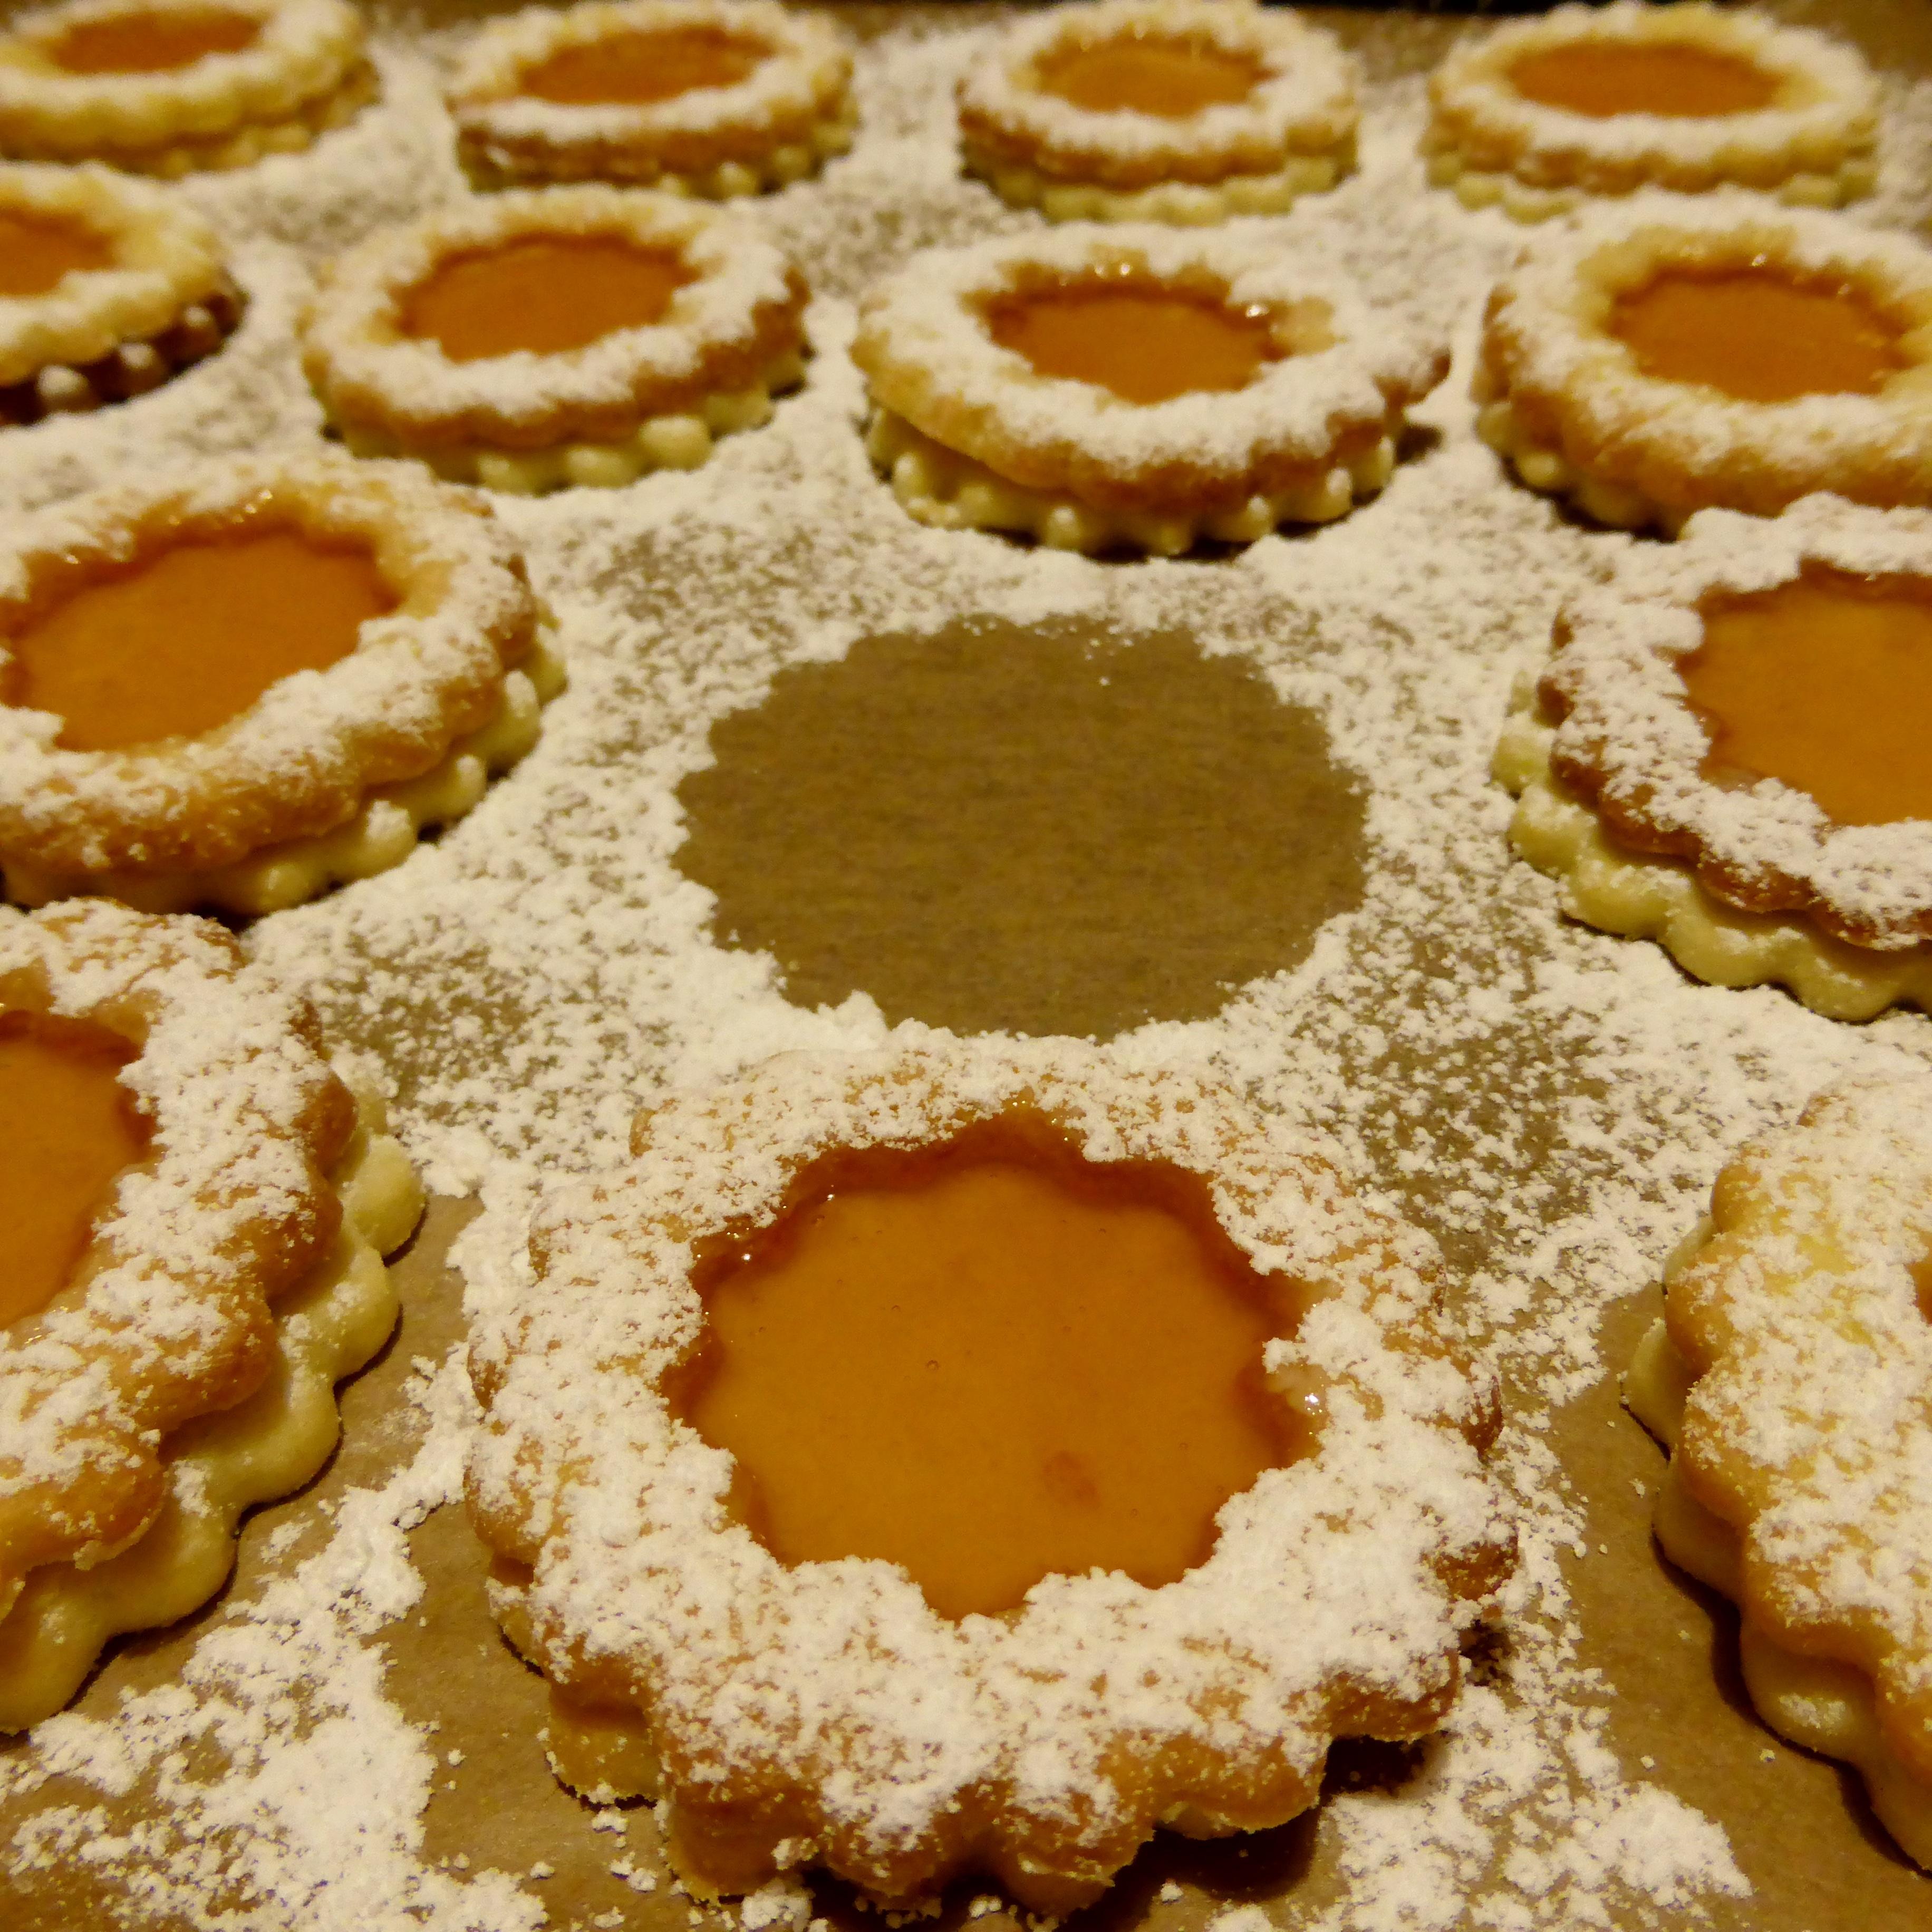 star muster gericht lebensmittel produzieren backen weihnachten pltzchen dessert kche backen weihnachtspltzchen gebck puderzucker glasur backwaren - Kuchen Muster